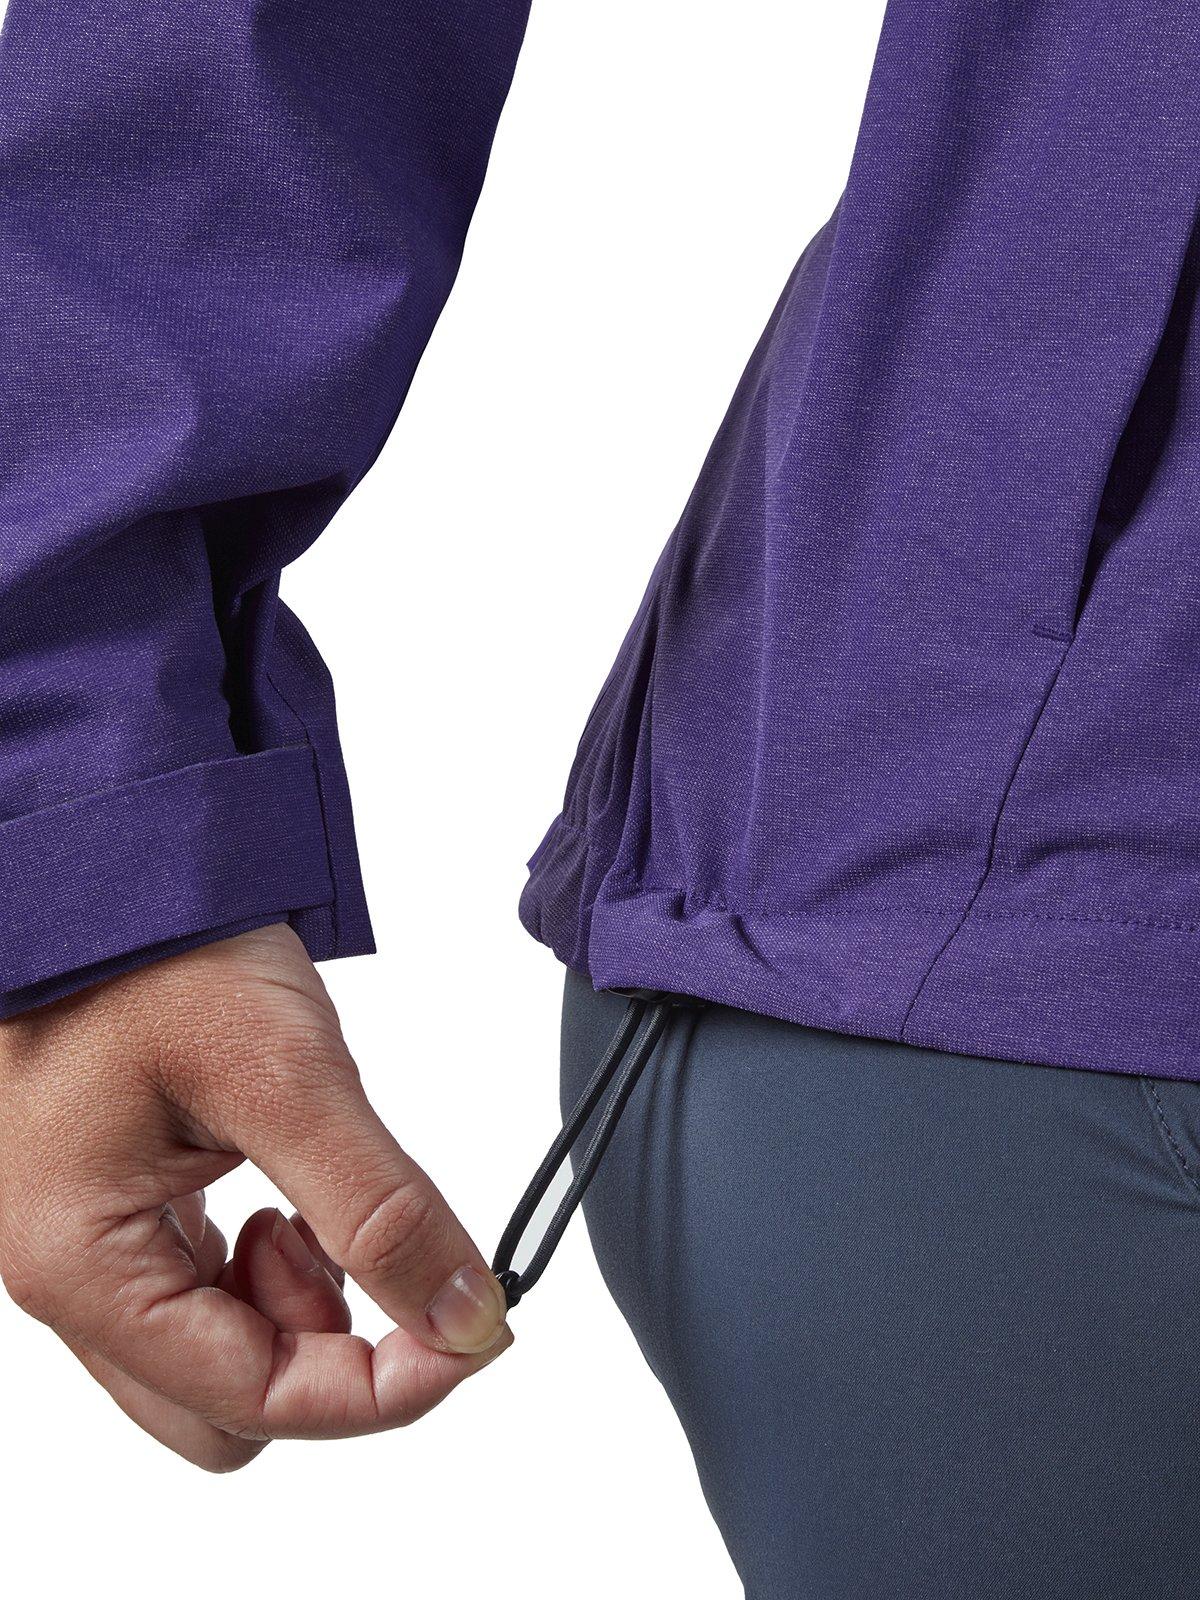 8165E7SqxKL - Berghaus Women's Elara Waterproof Jacket